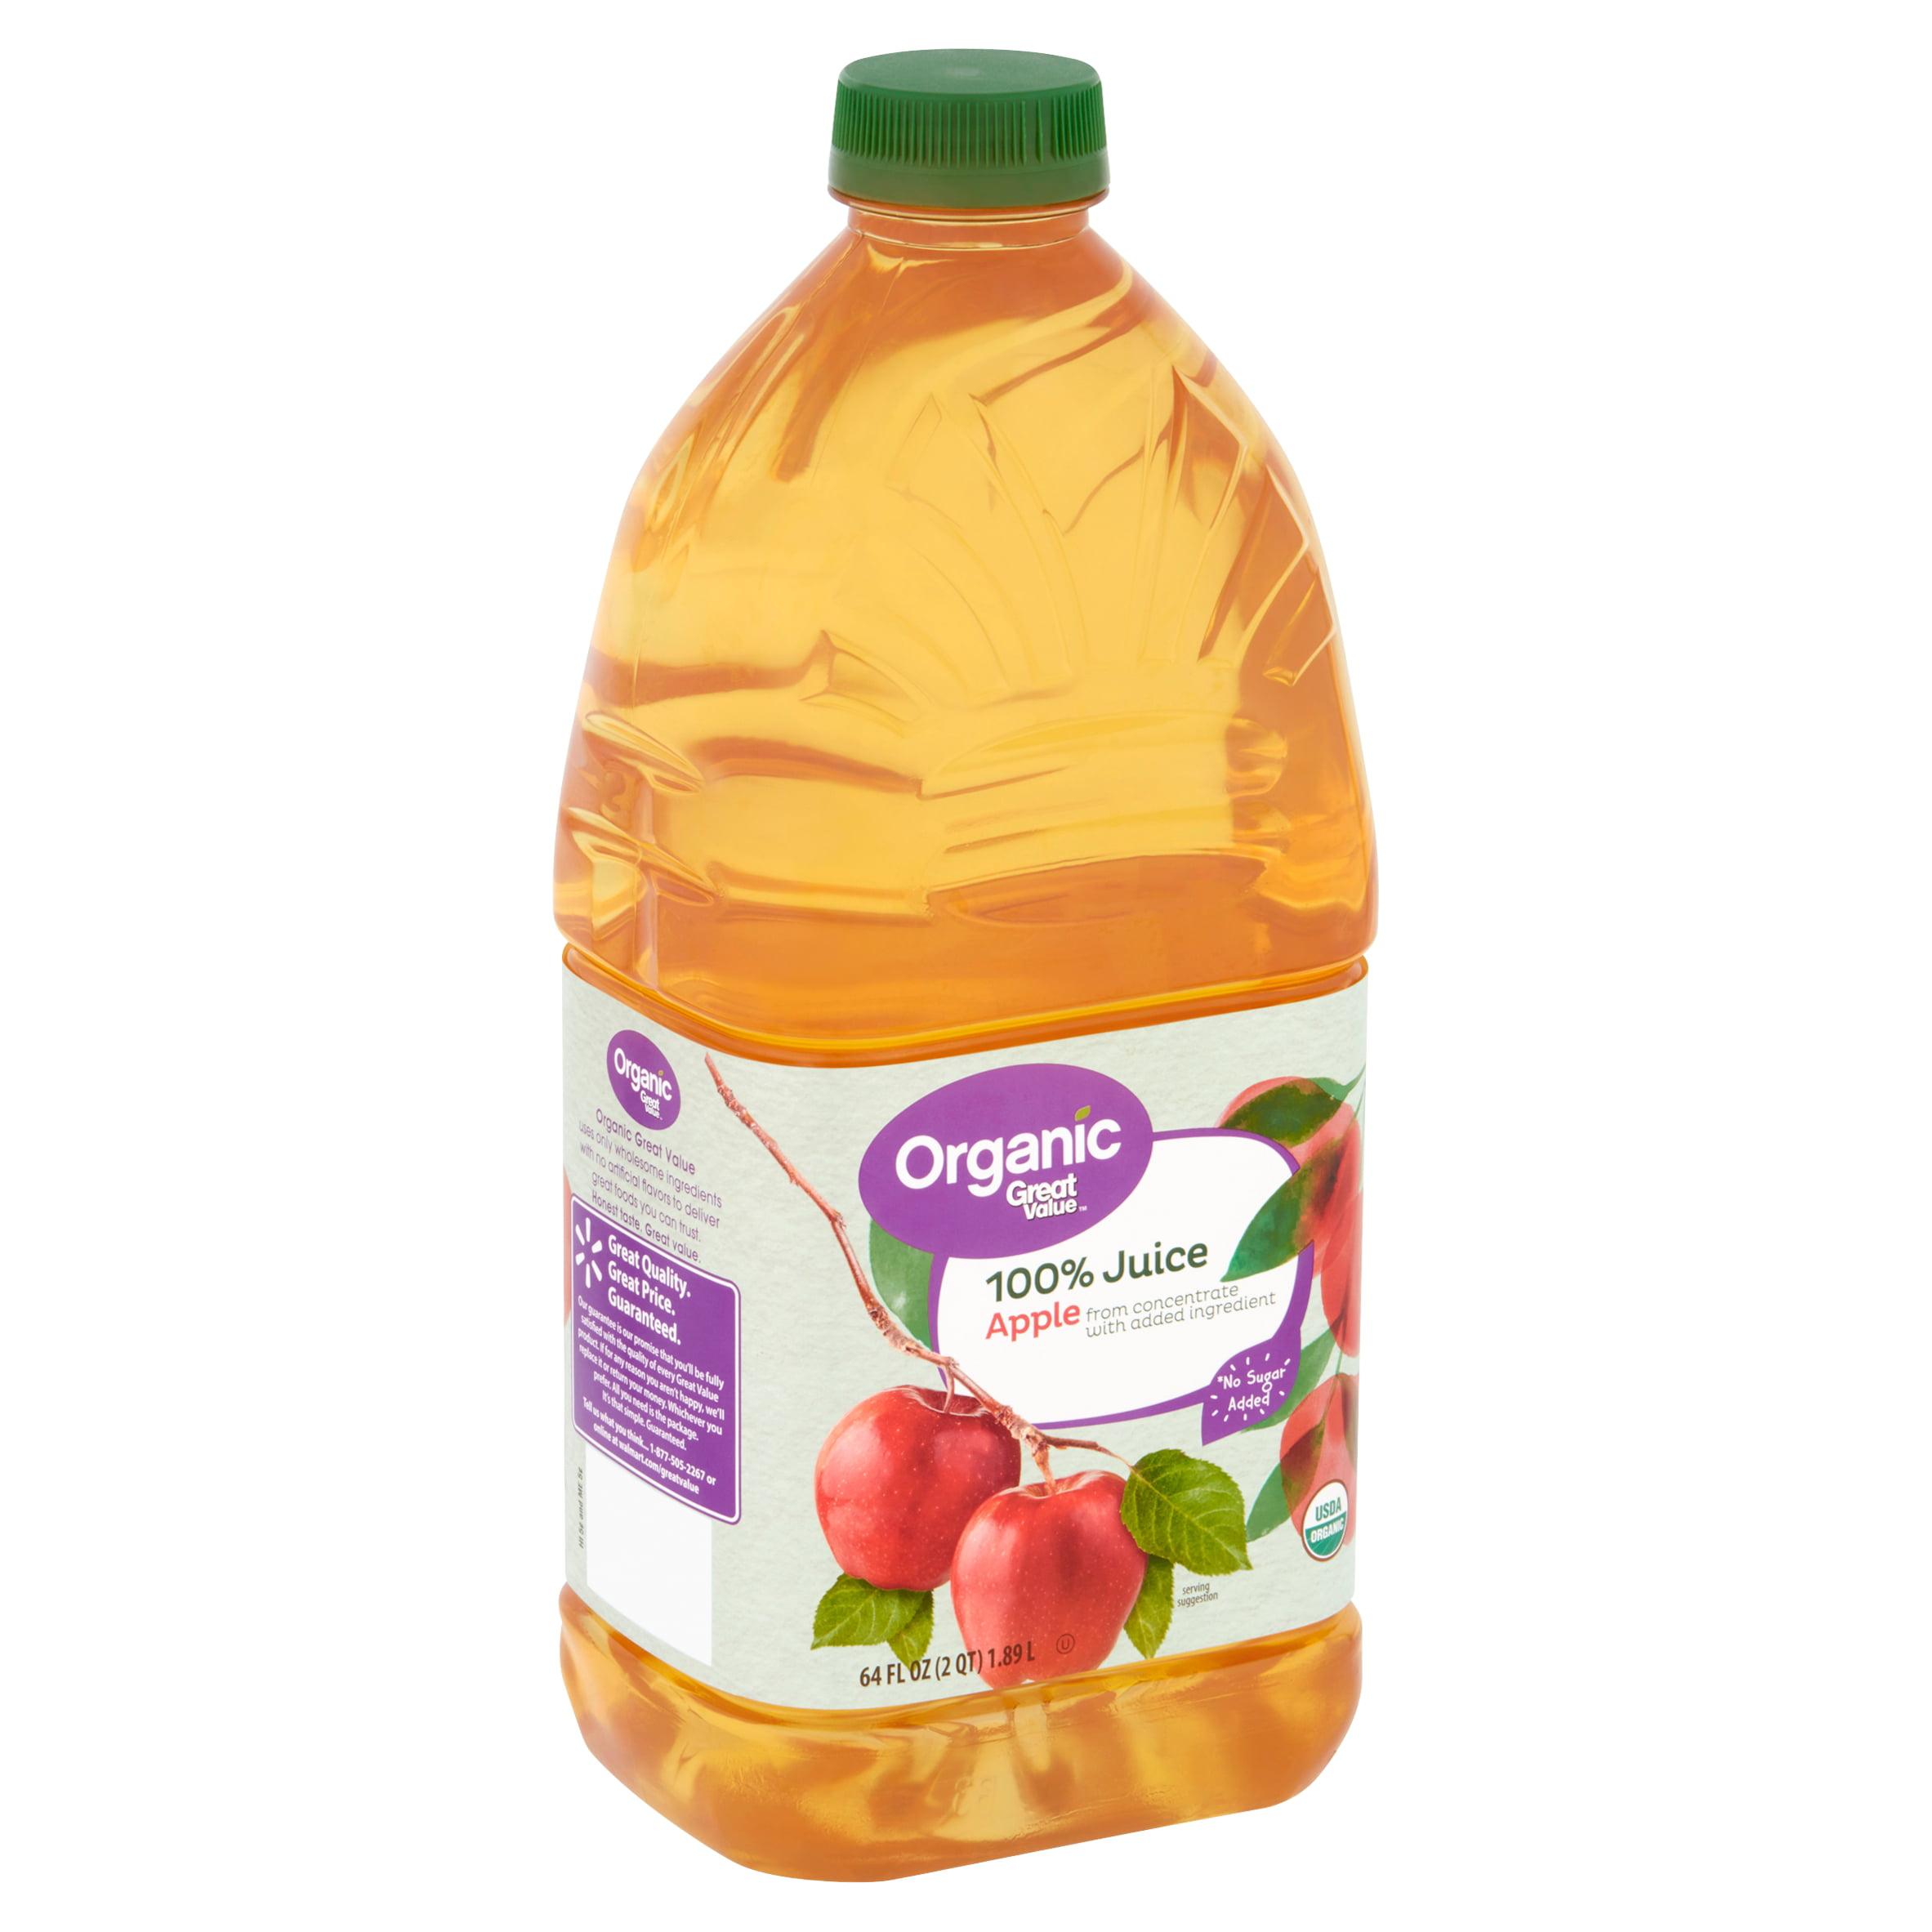 Great Value Organic Apple 100% Juice, 64 fl oz